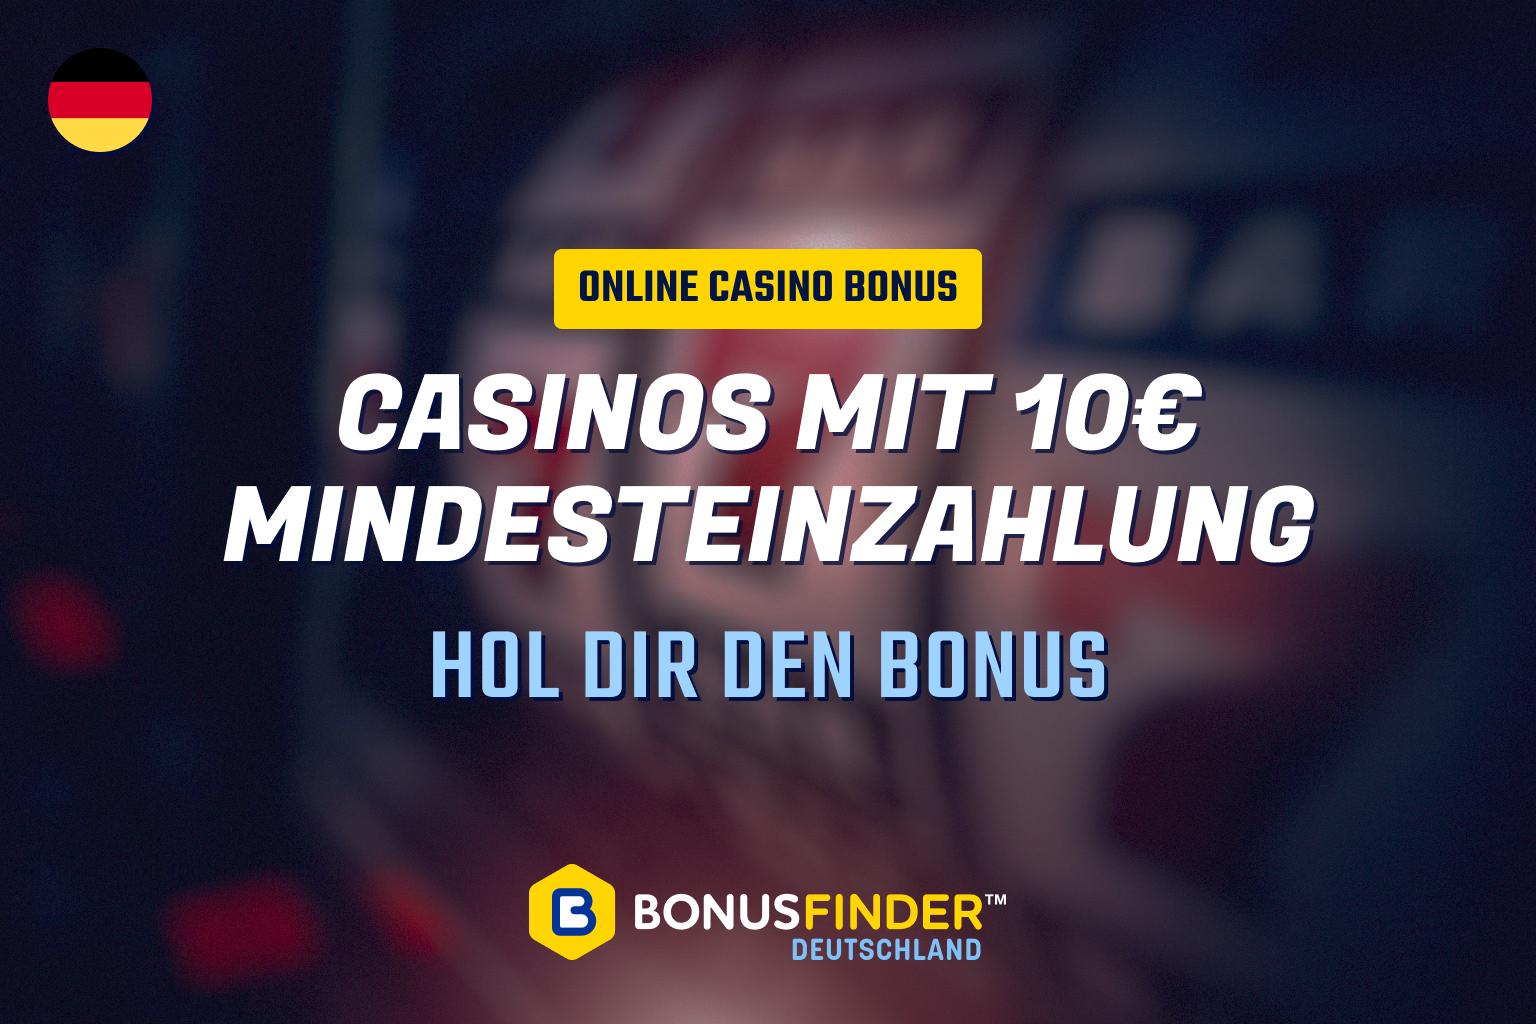 casino 10 euro mindesteinzahlung